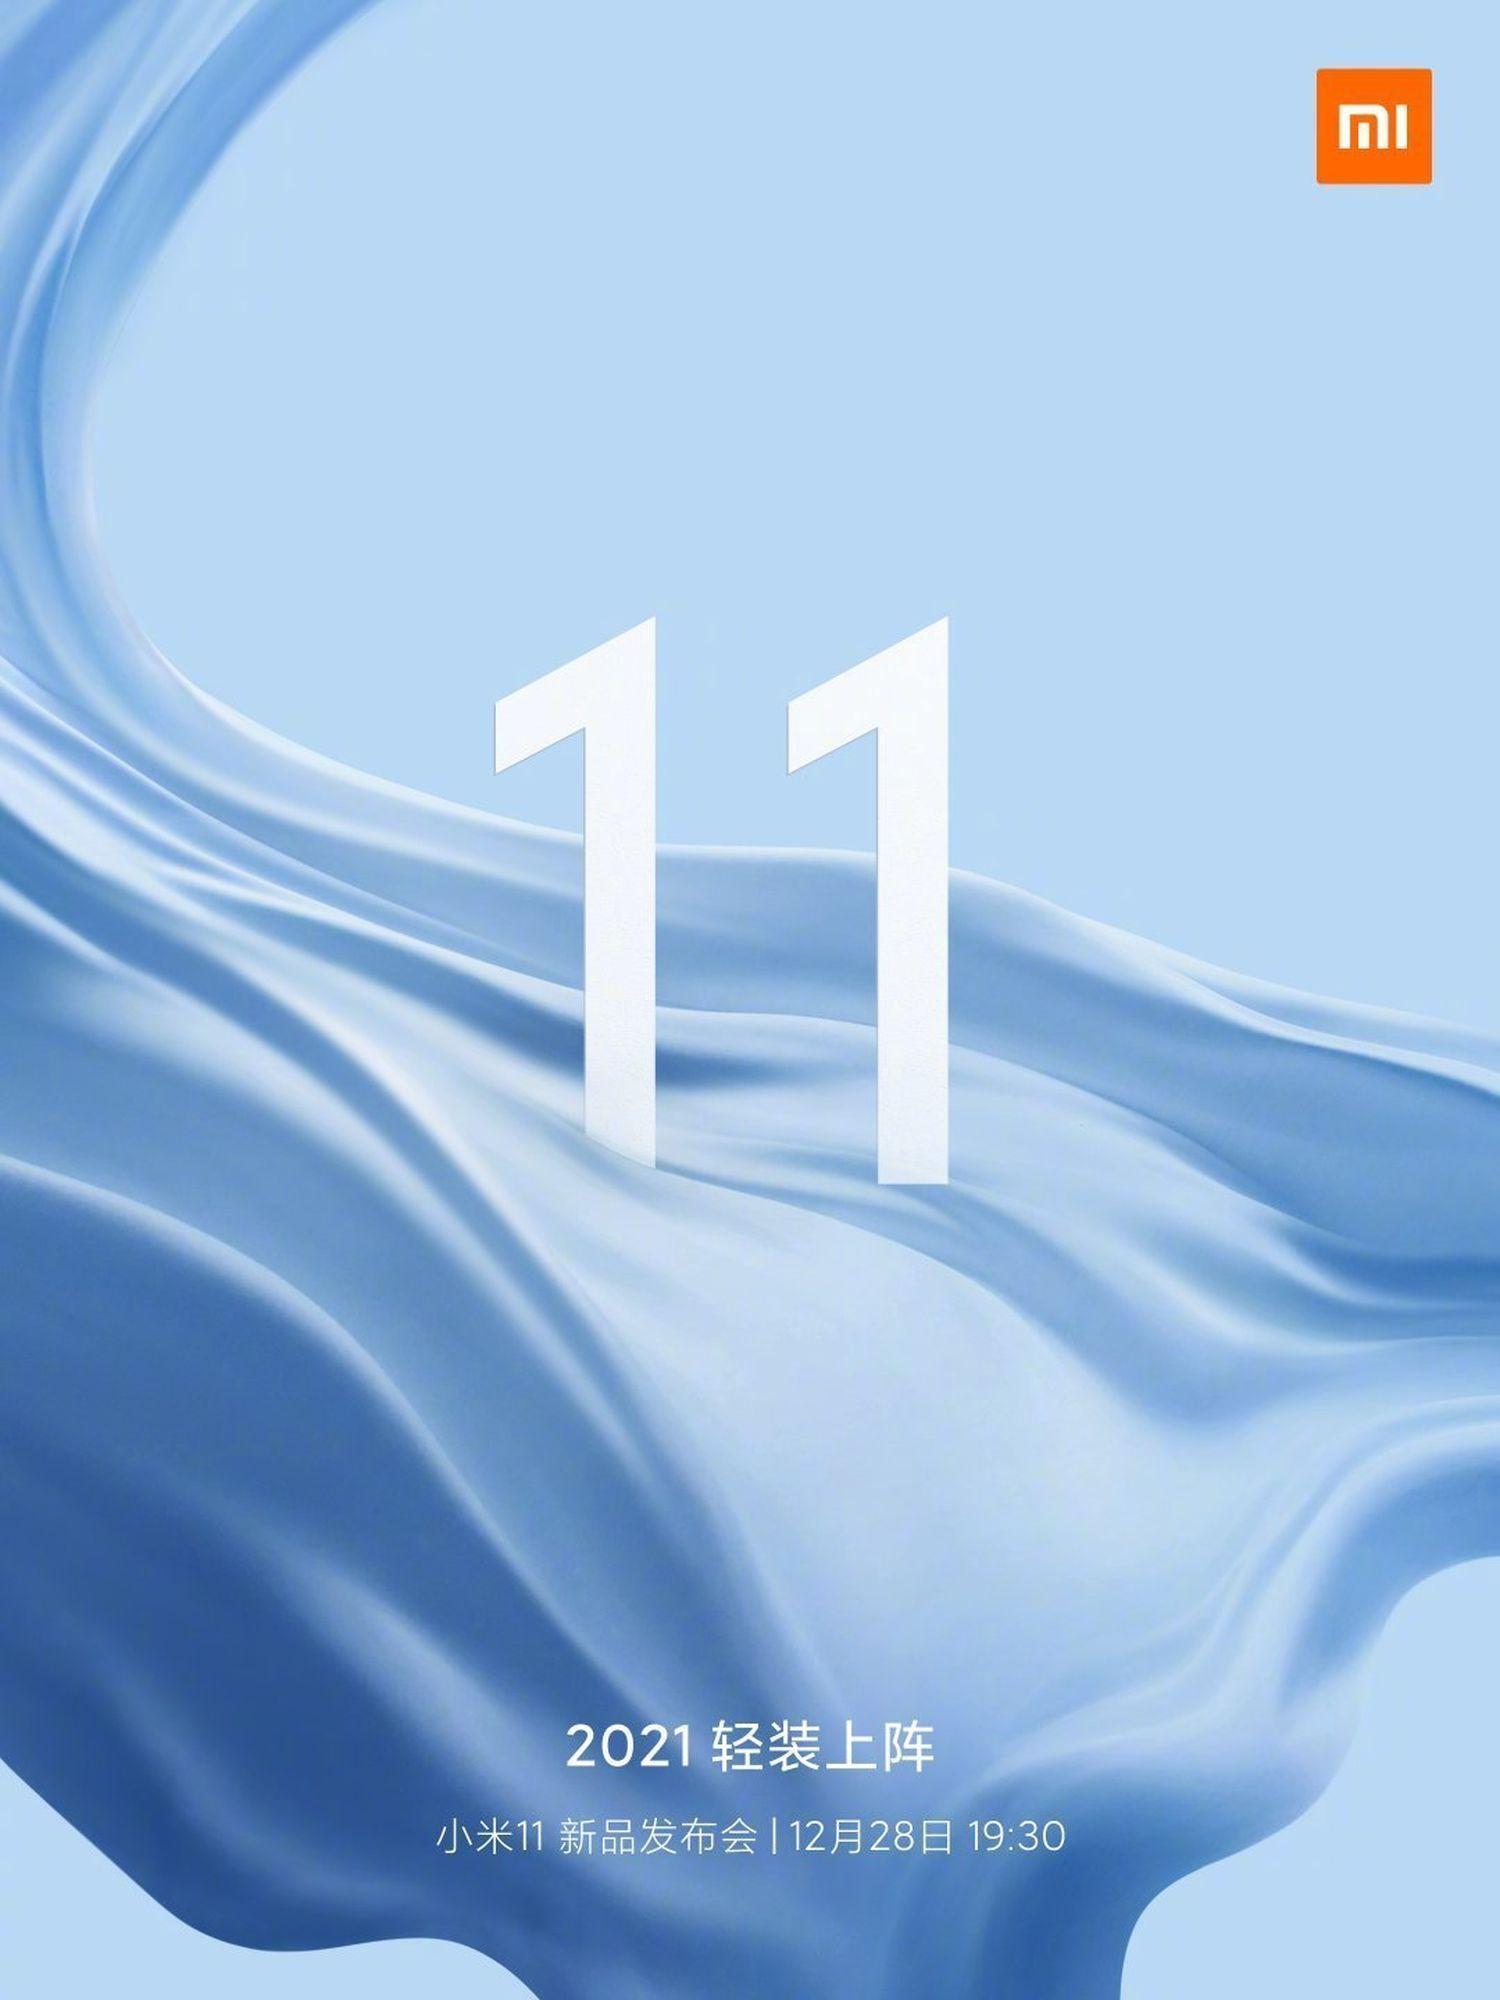 Дата выхода Xiaomi Mi 11